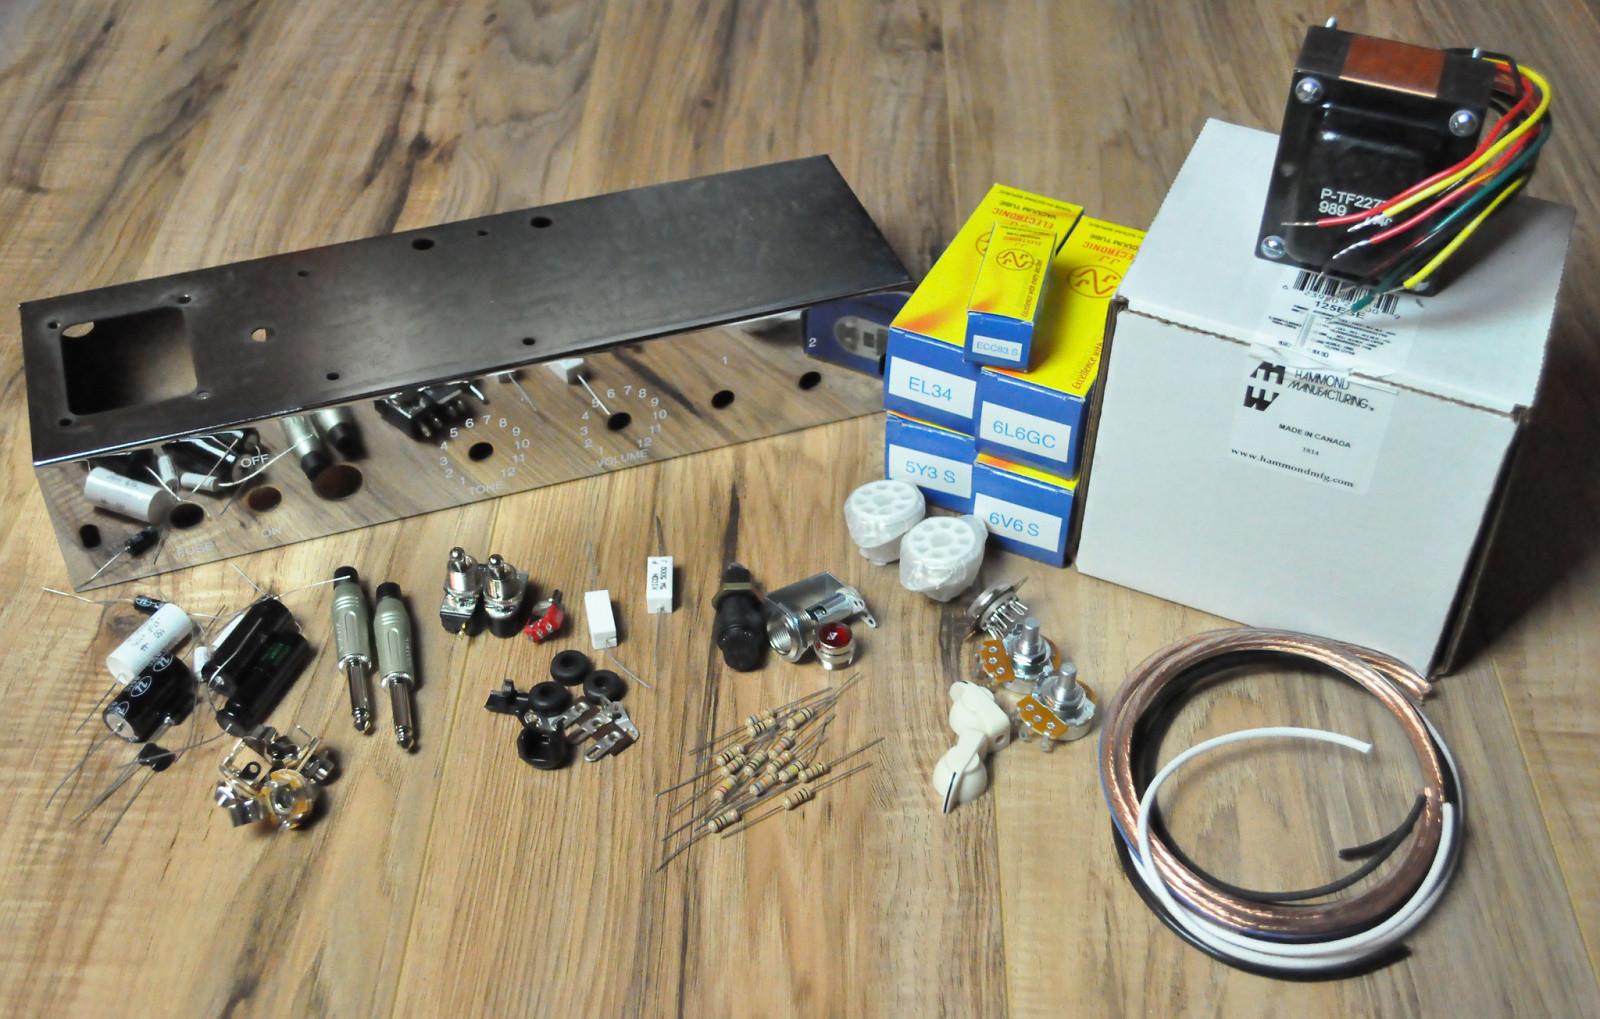 tube amp kit two stroke diy guitar amplifier without speakers. Black Bedroom Furniture Sets. Home Design Ideas